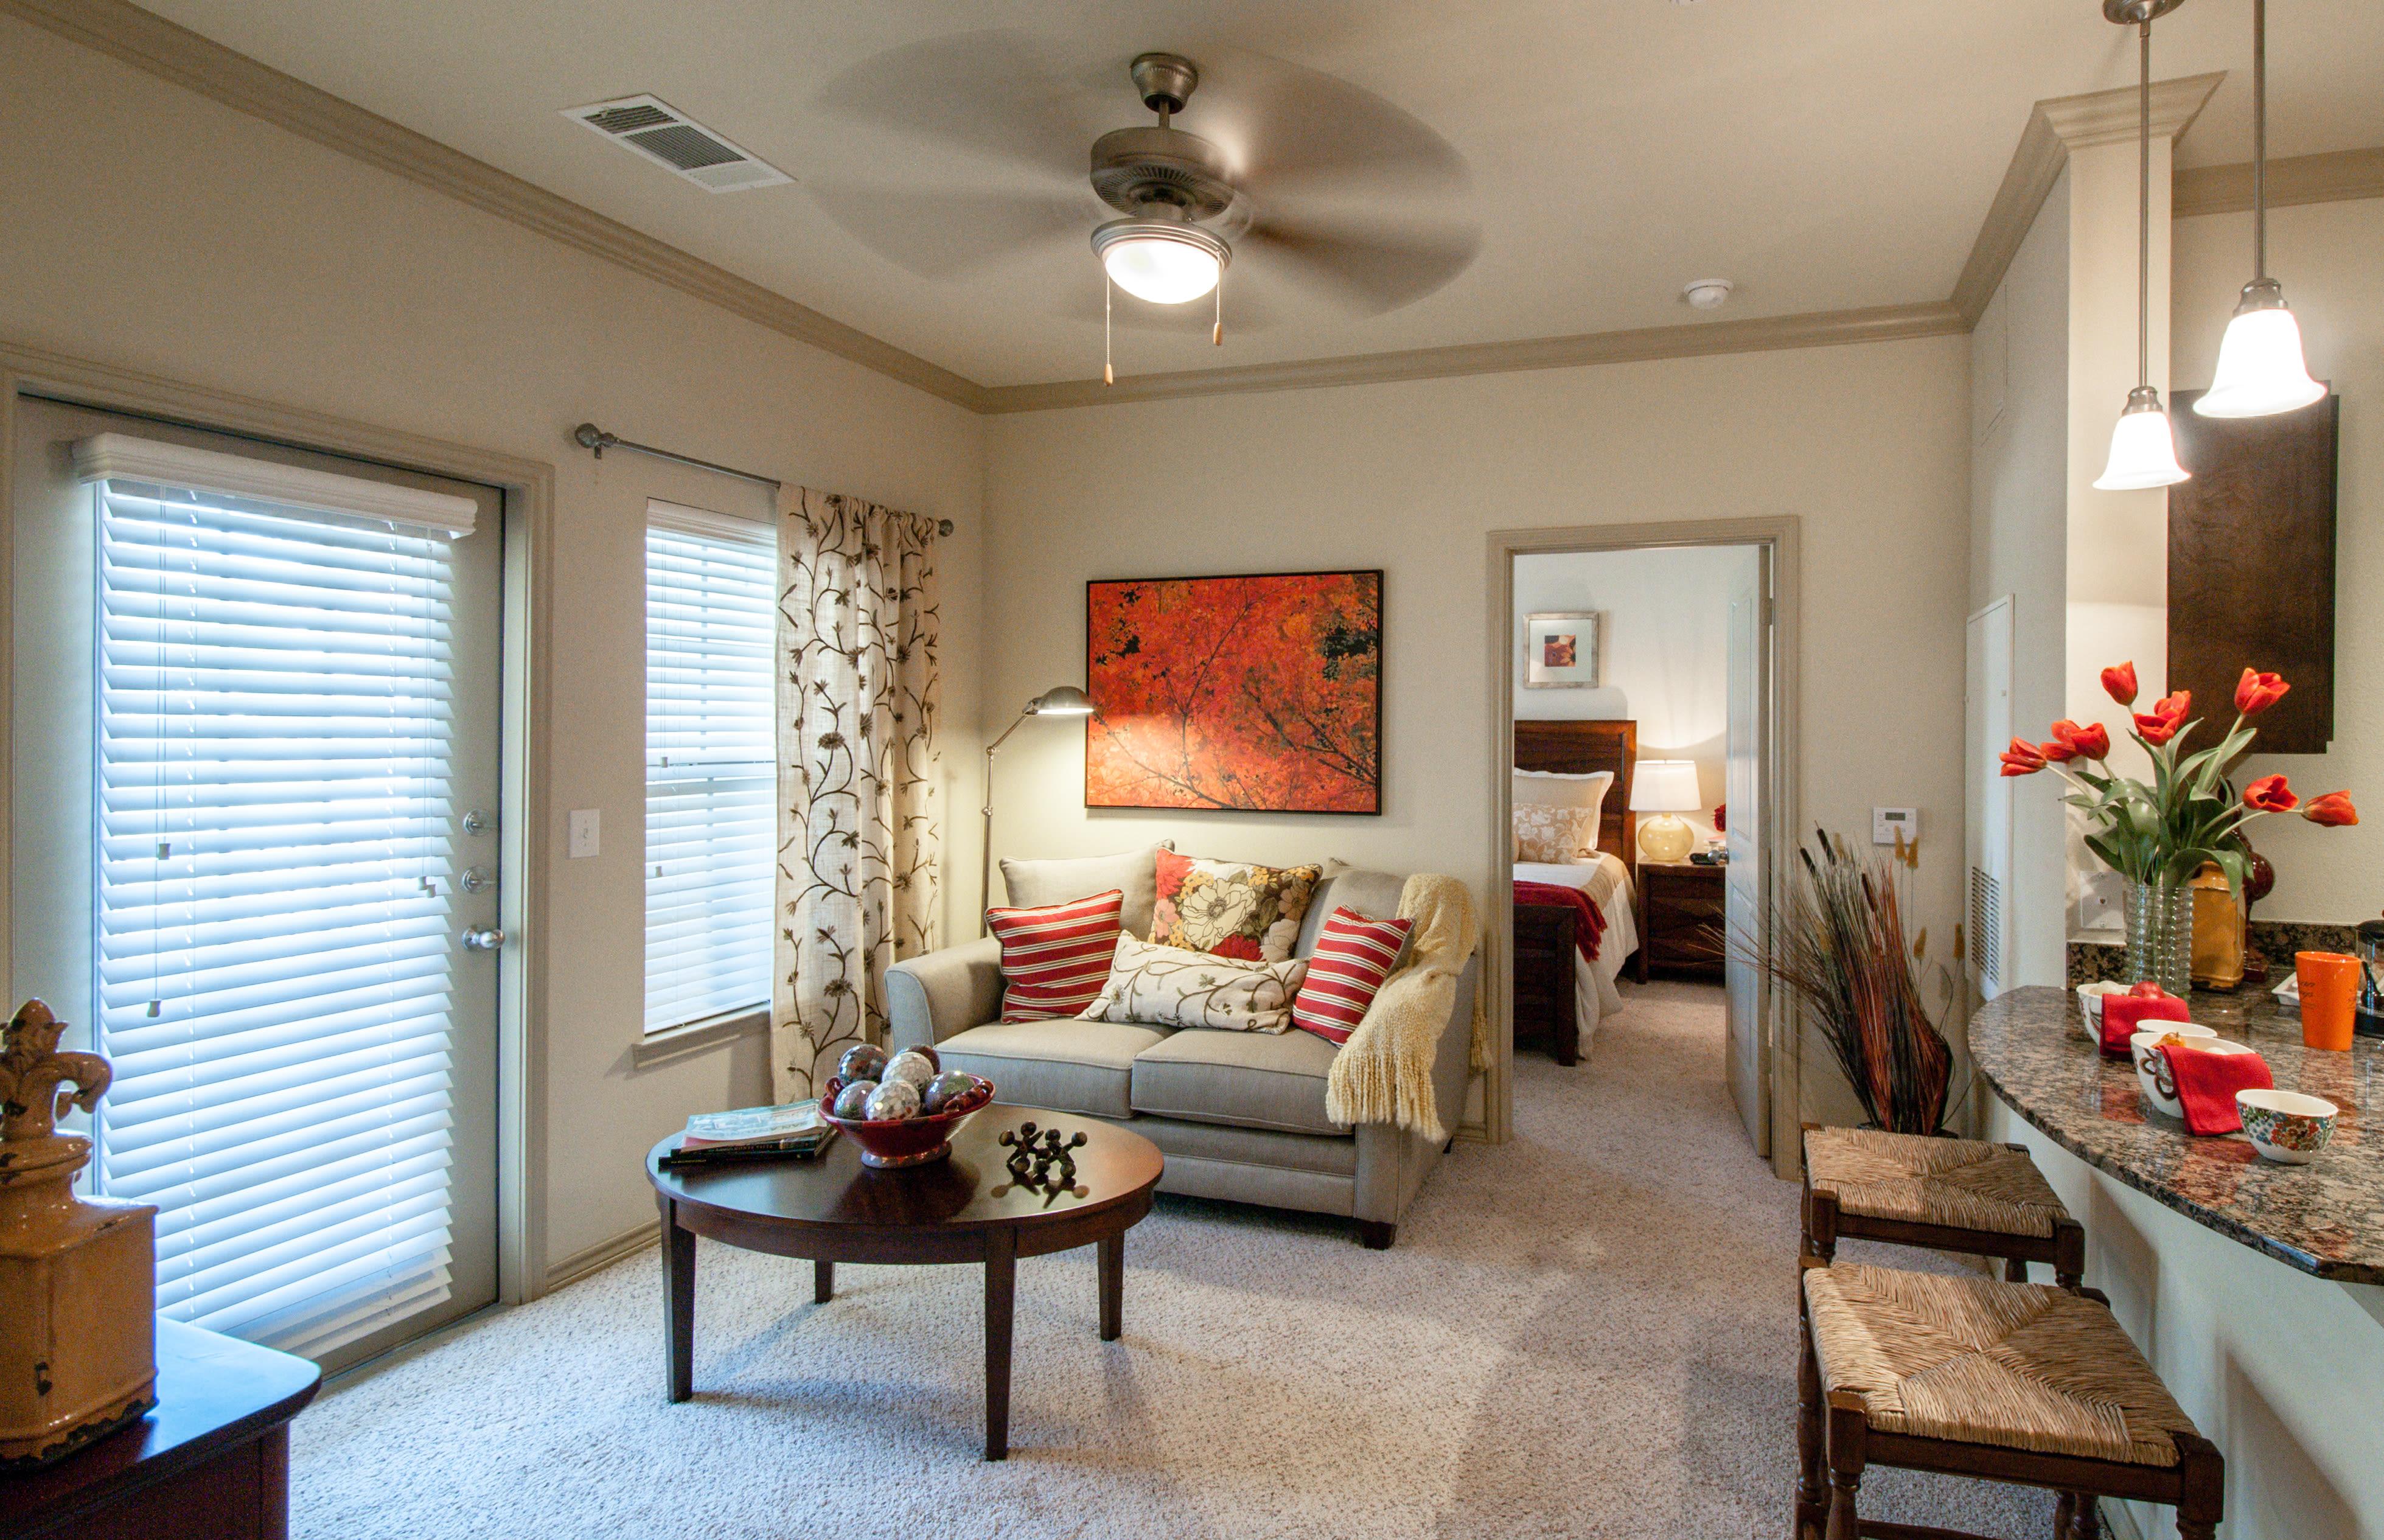 North San Antonio Tx Apartments For Rent Pecan Springs